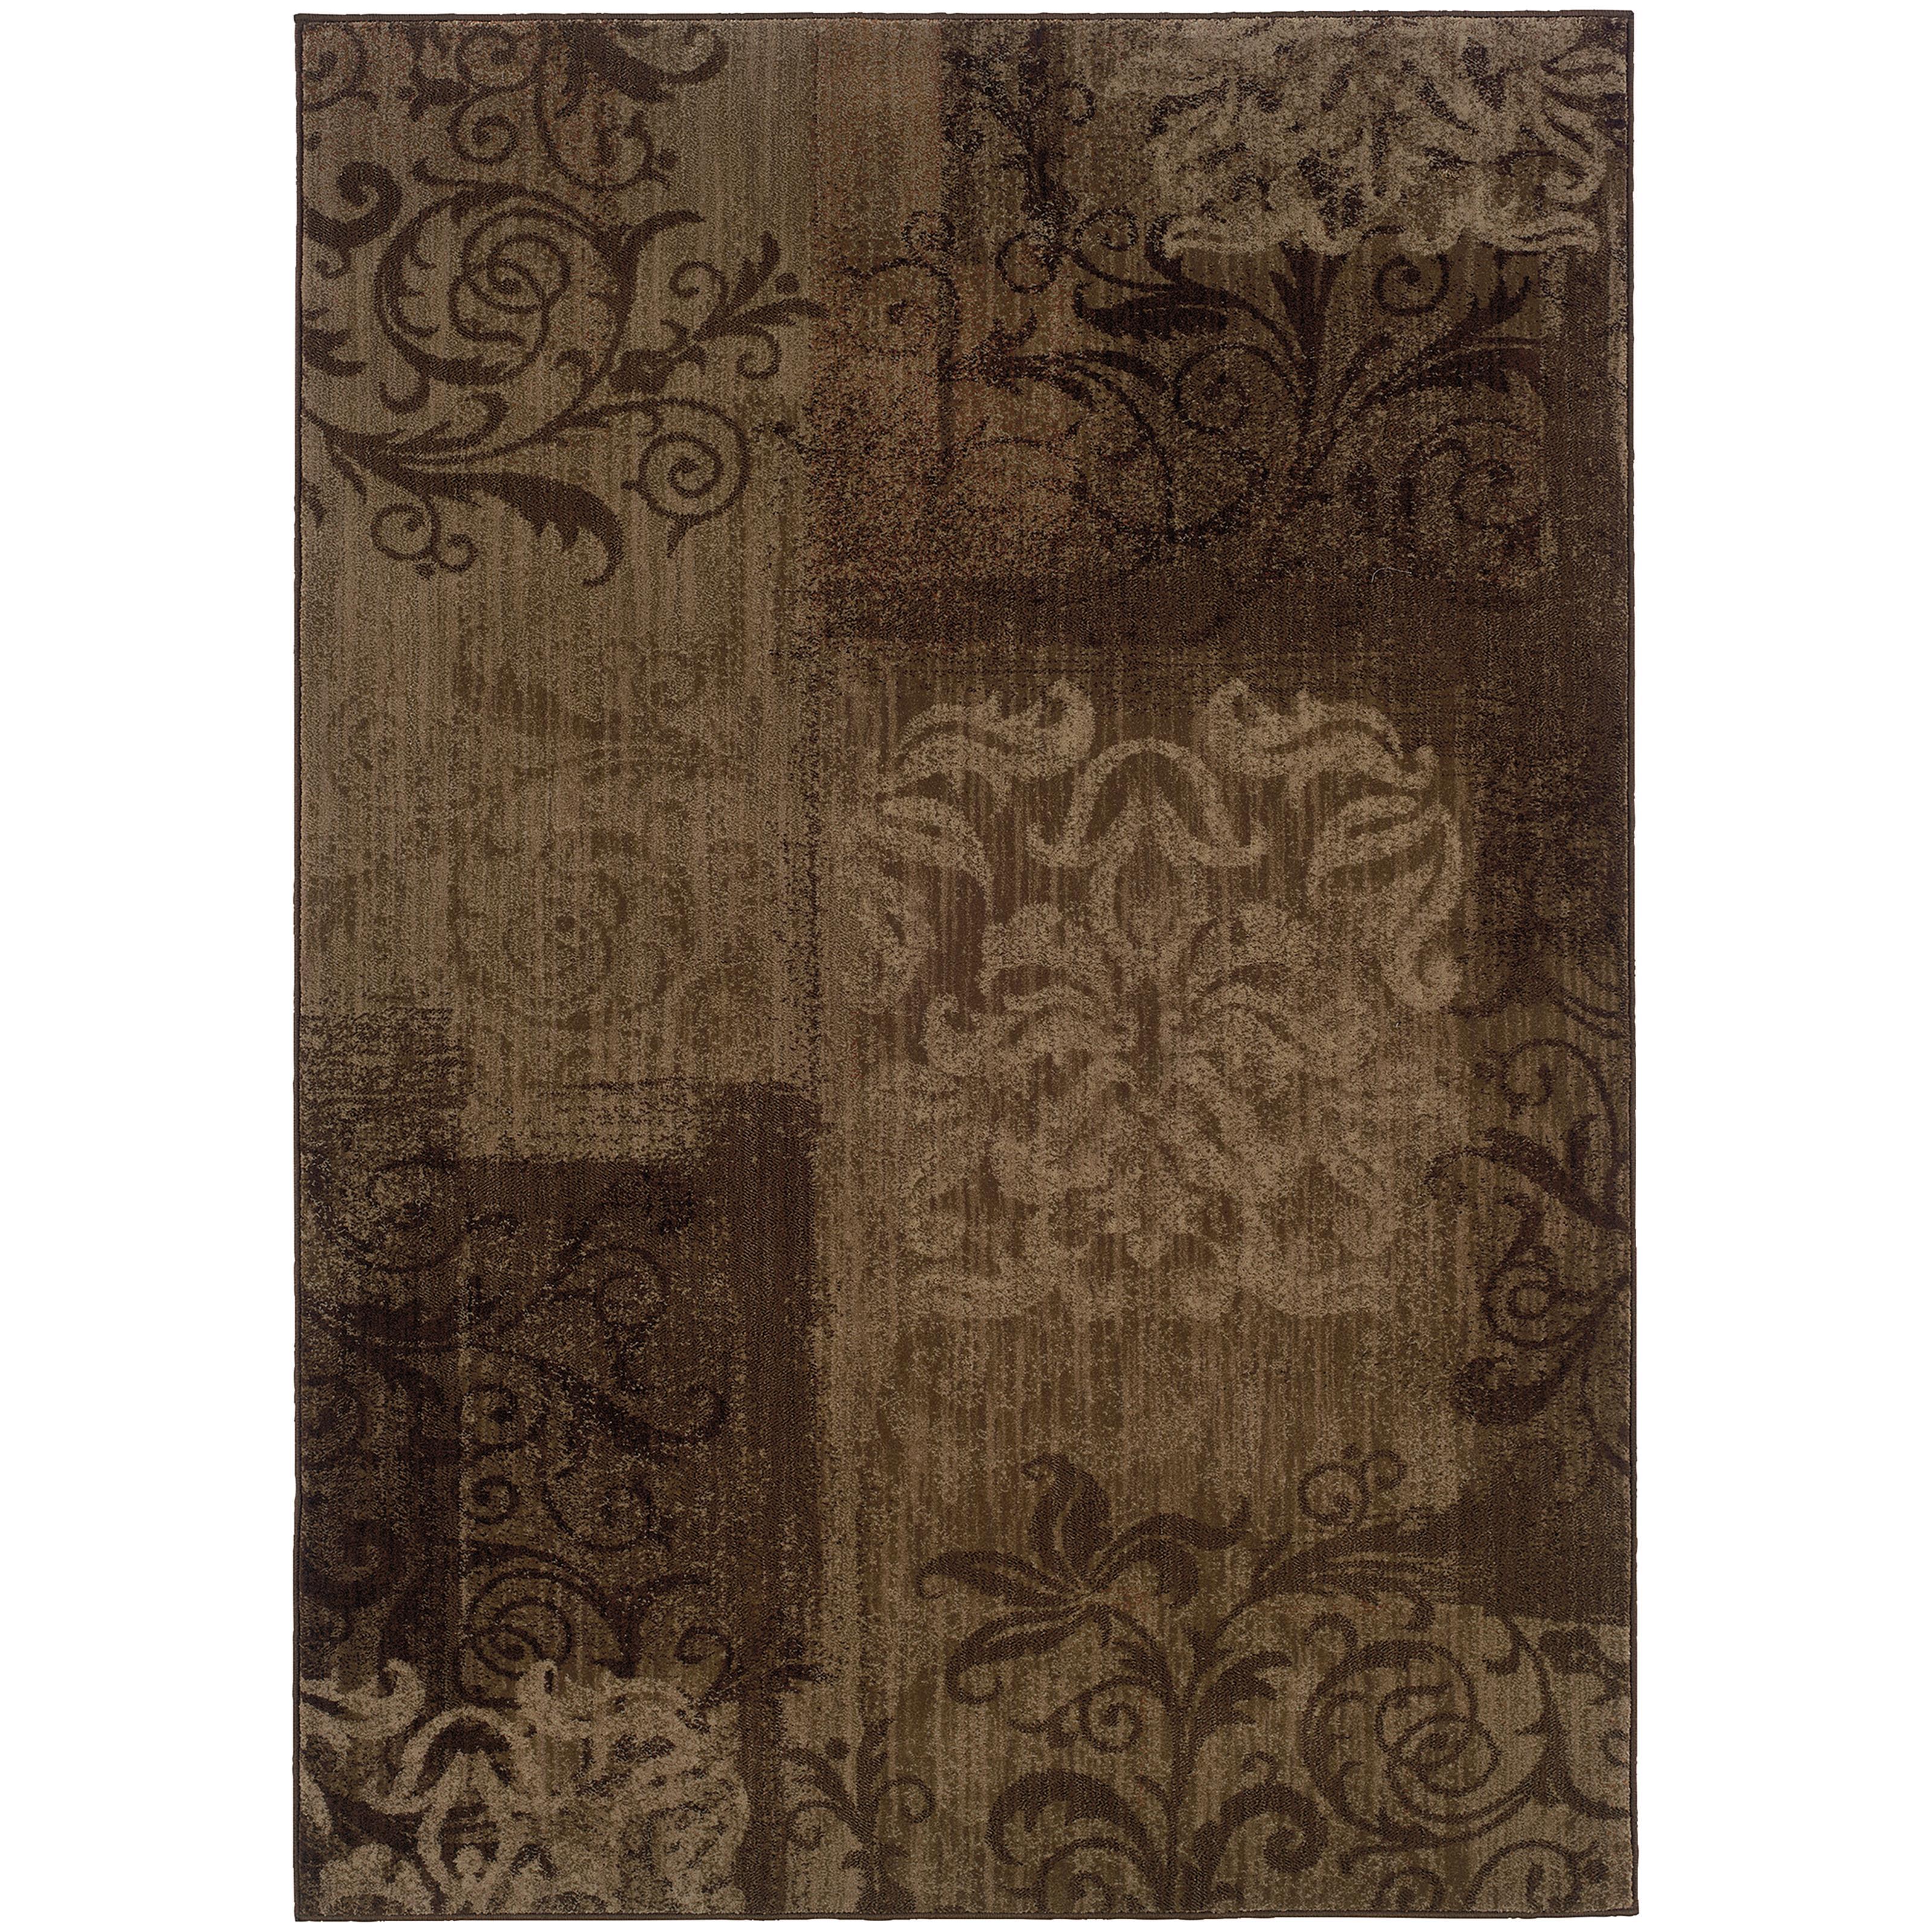 "Oriental Weavers Allure 9'10"" X 12' 9"" Rug - Item Number: A060B1300390ST"